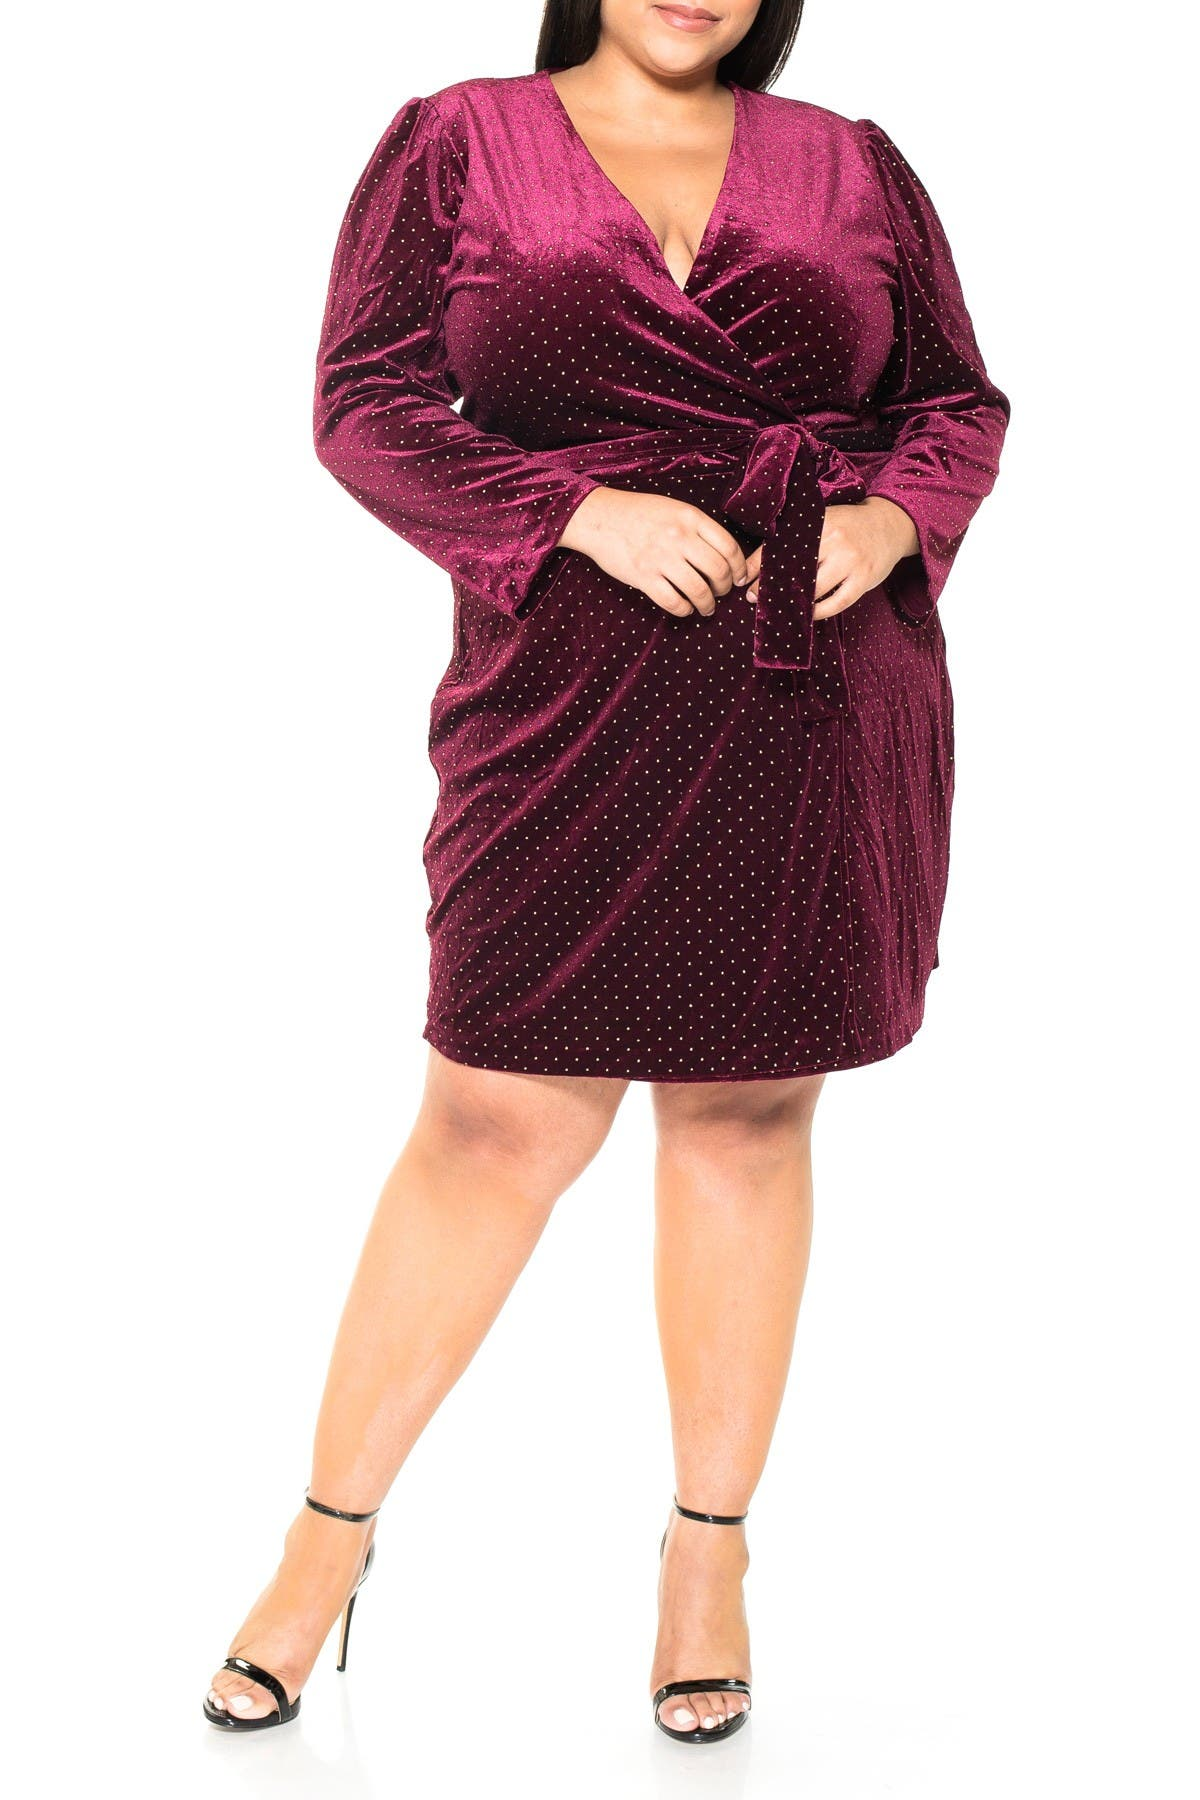 Image of Alexia Admor Amelia Wrap Dress